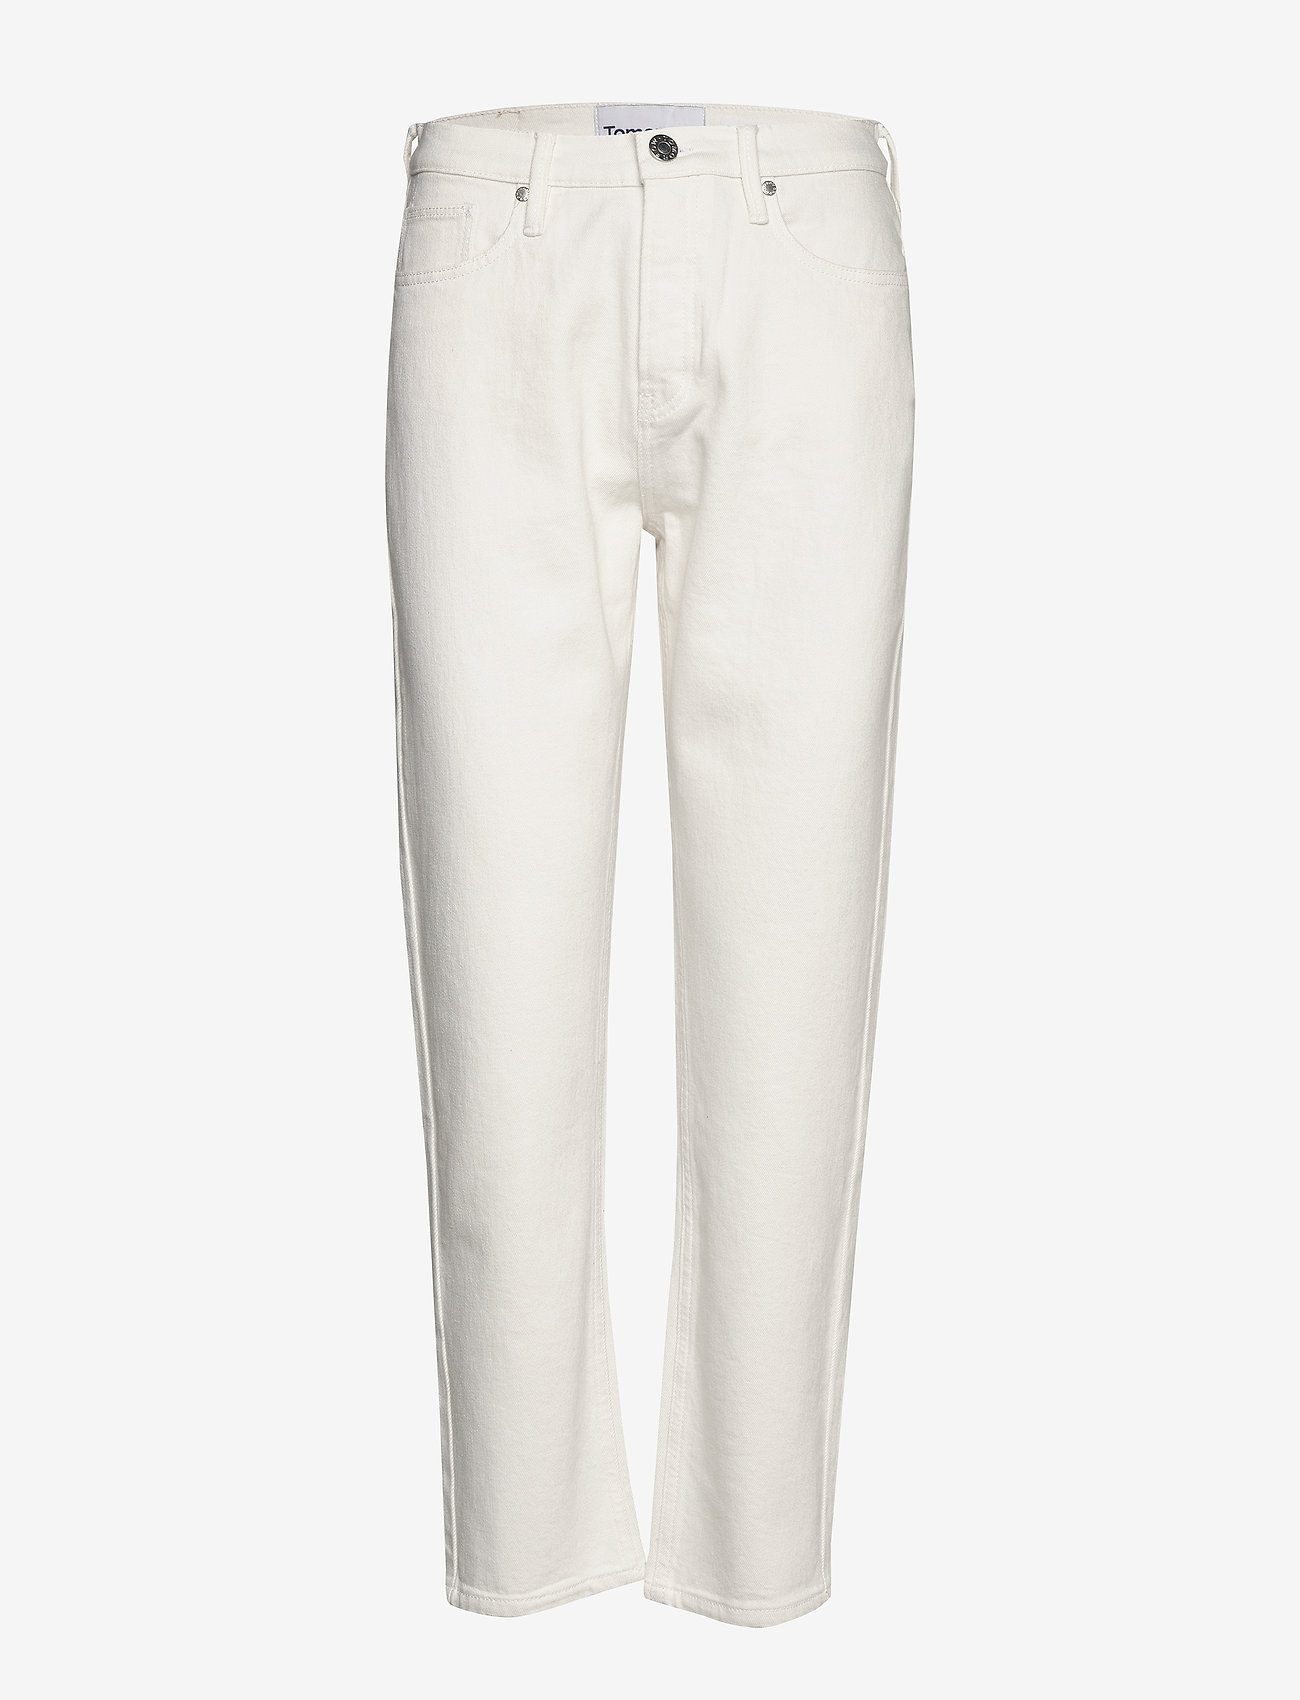 Tomorrow - Teresa regular jeans ecru - straight regular - ecru - 0